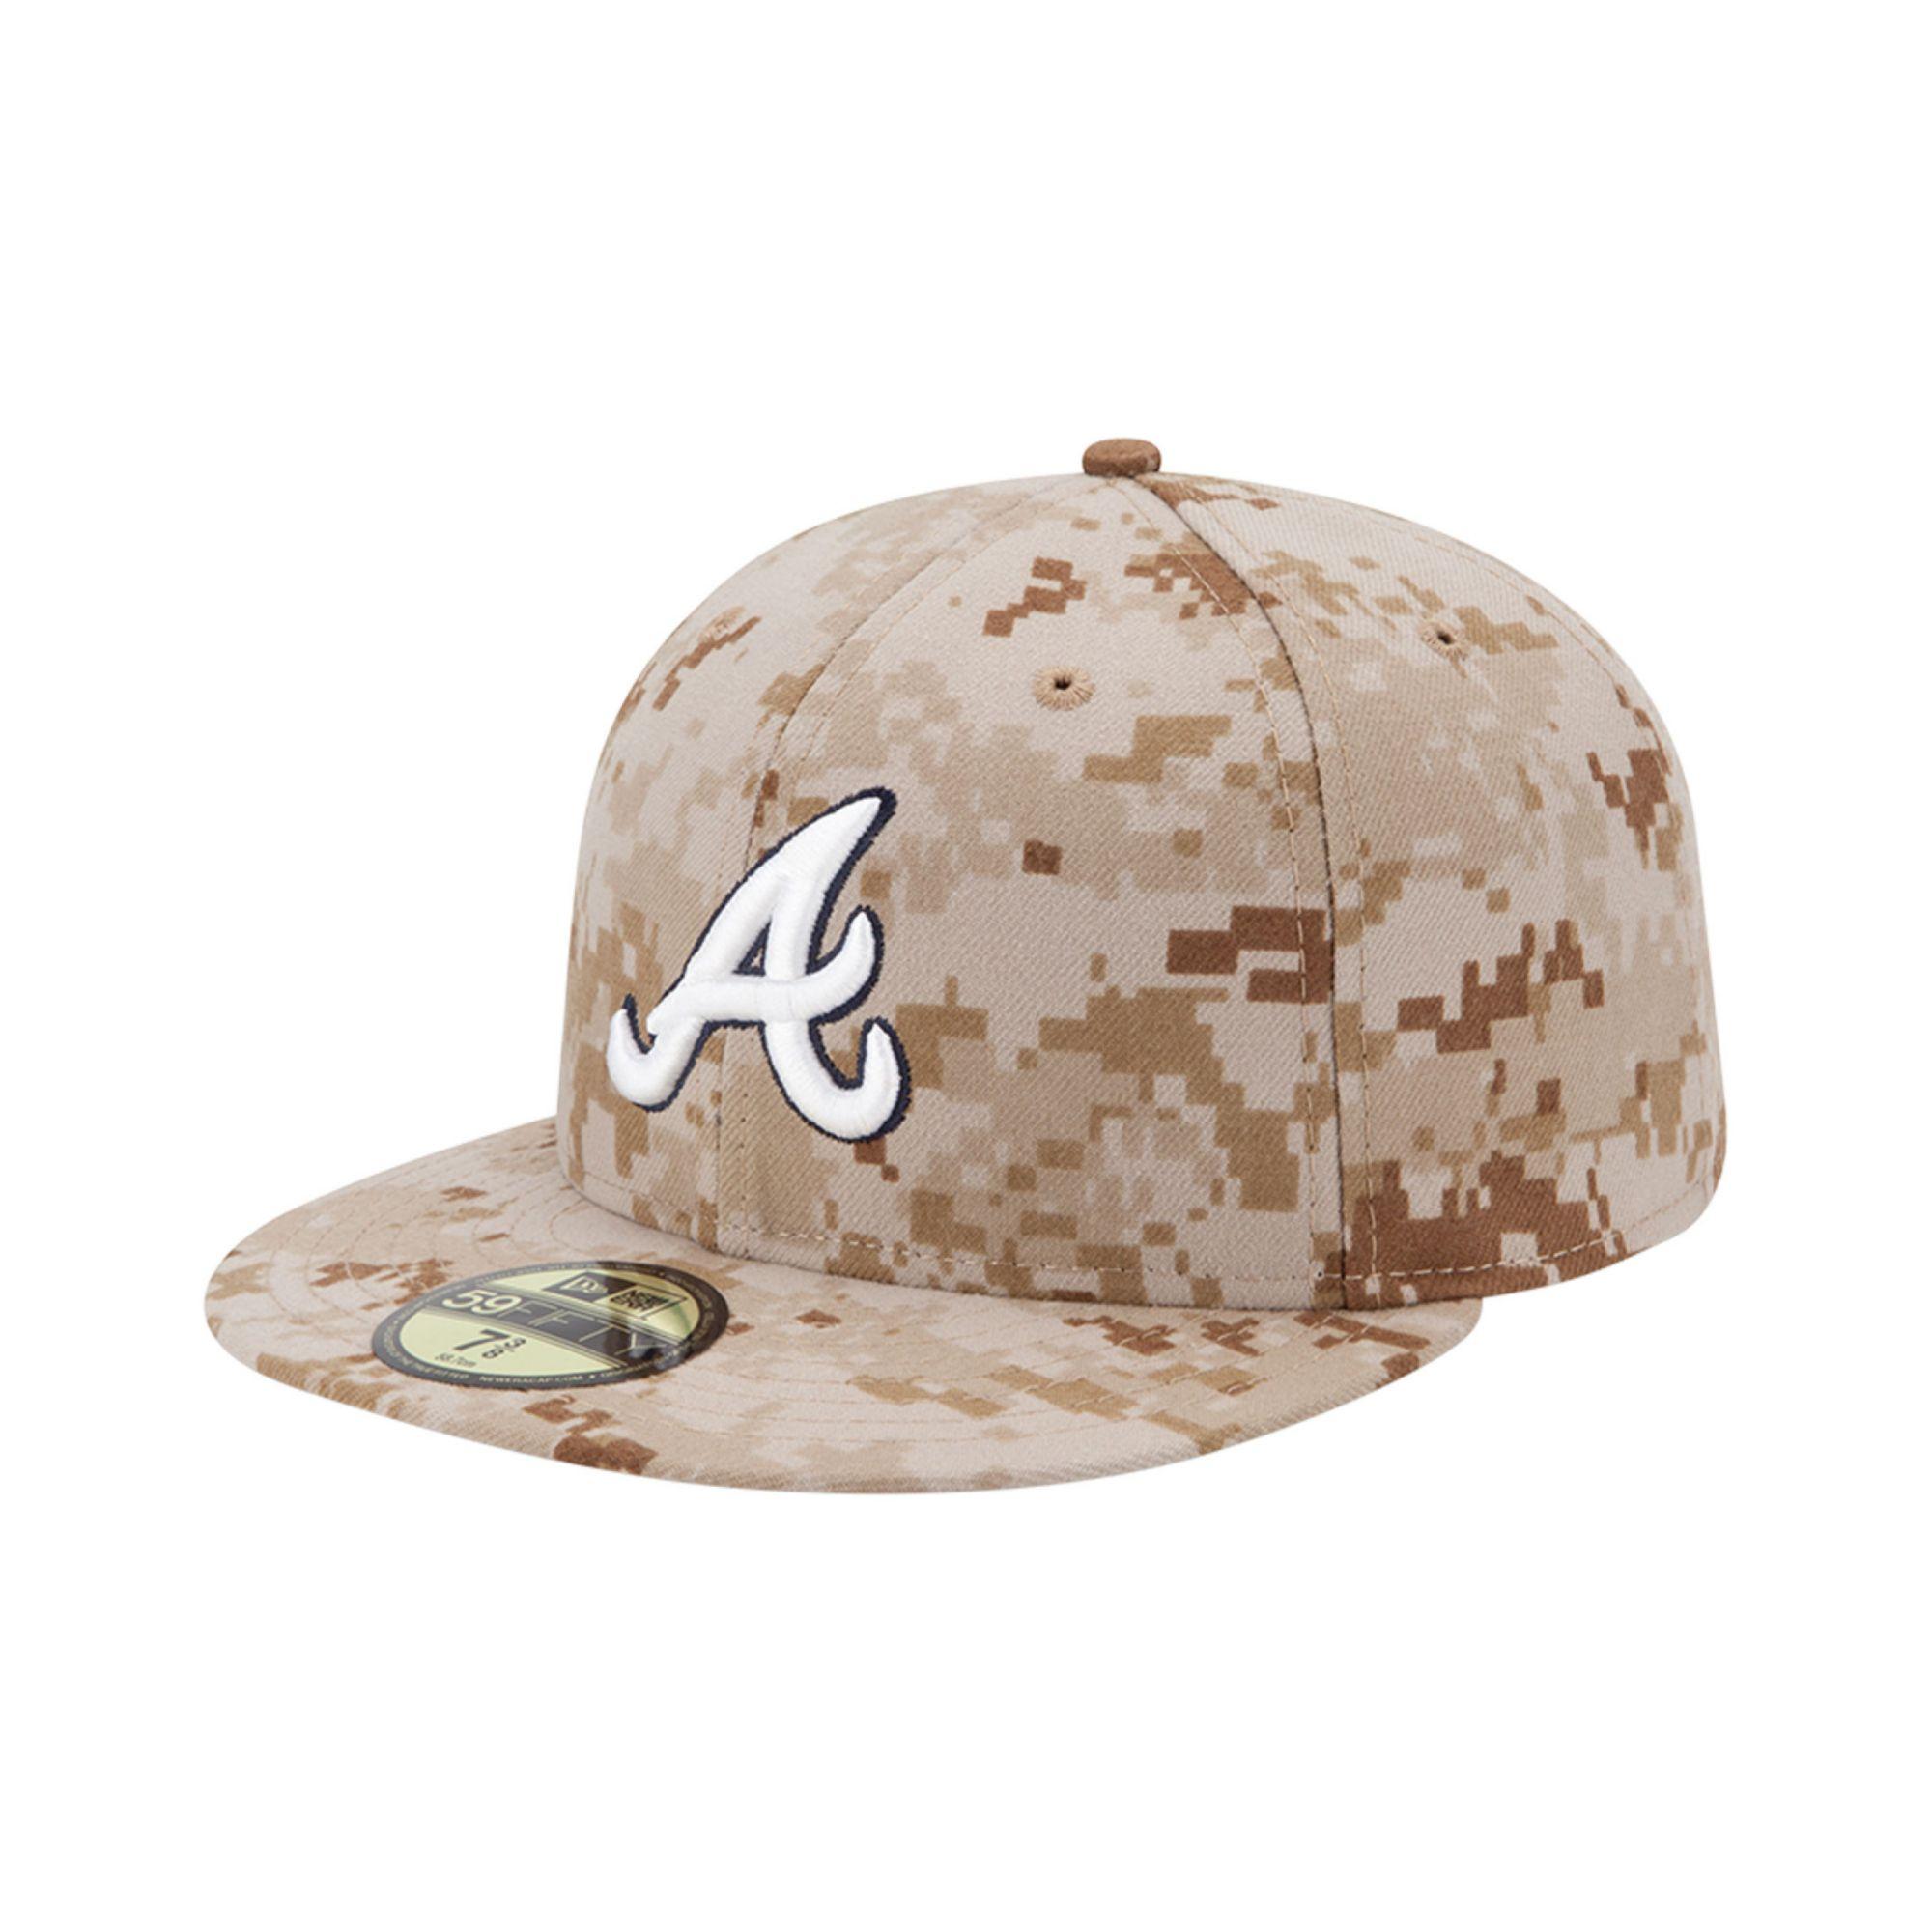 Lyst - KTZ Atlanta Braves Mlb Memorial Day Stars Stripes 59fifty Cap ... ba7ca6b30253